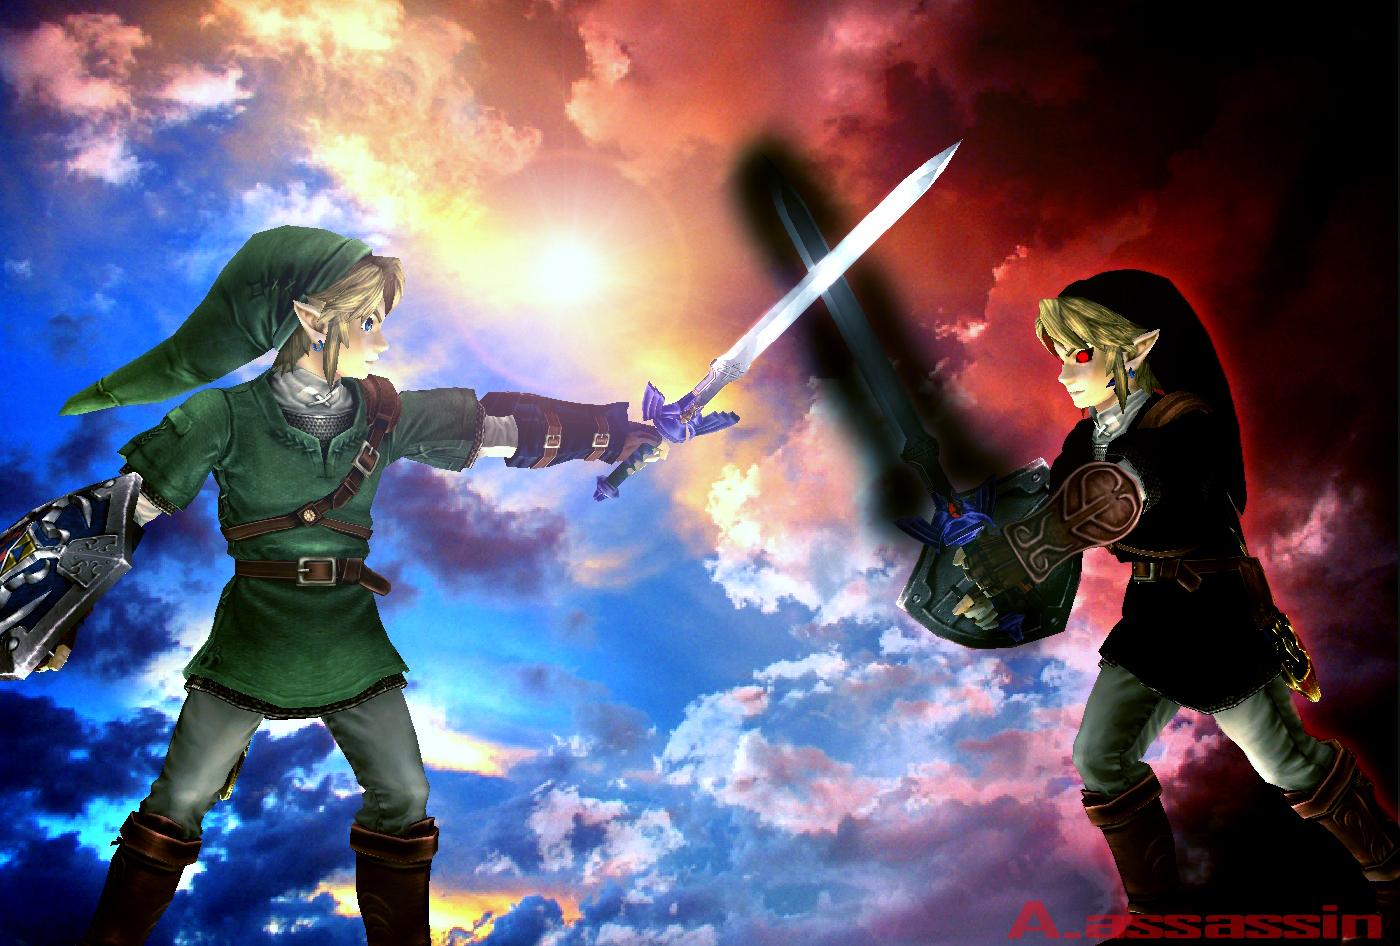 Link vs Dark Link by angelnn 1400x946